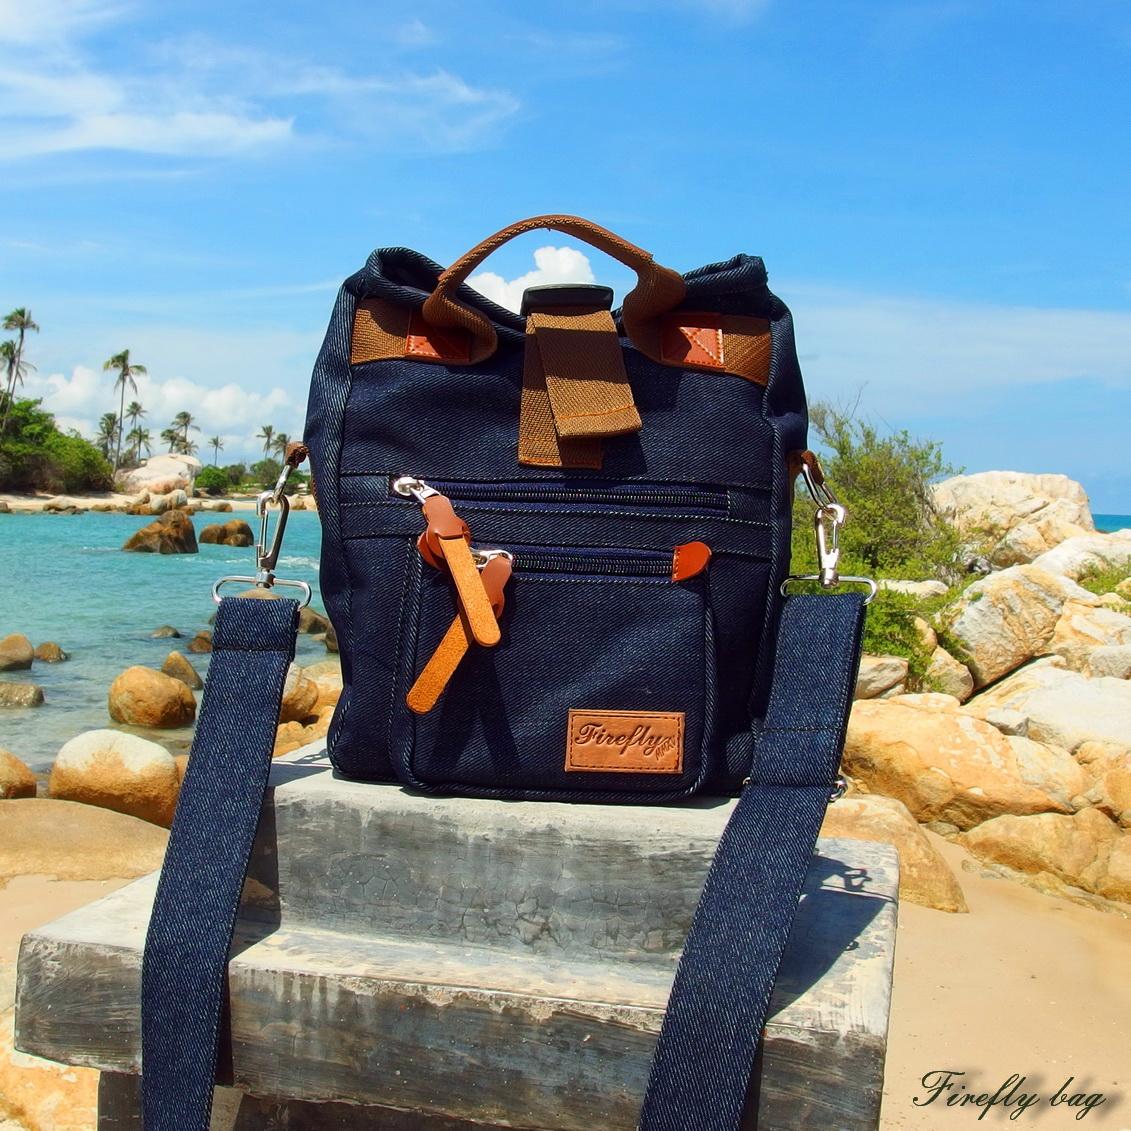 Sling bag tokopedia -  Firefly Foxray Navy Sling Bag